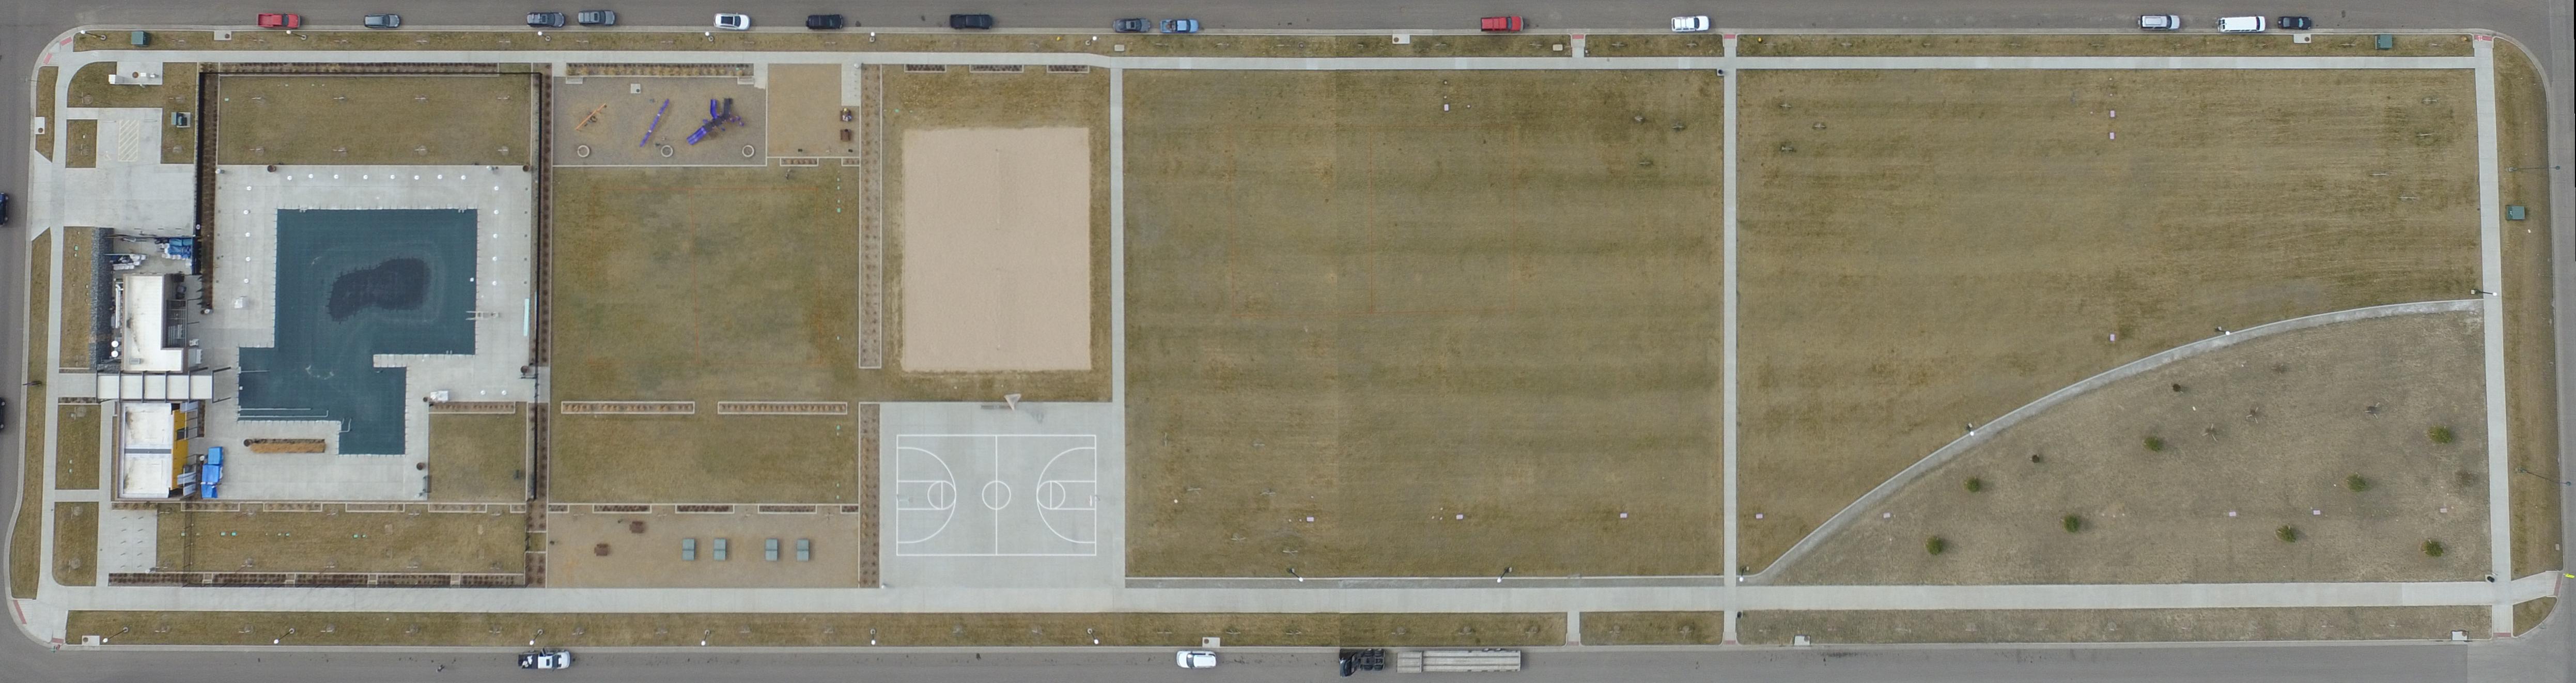 runway 35 stitch (1)